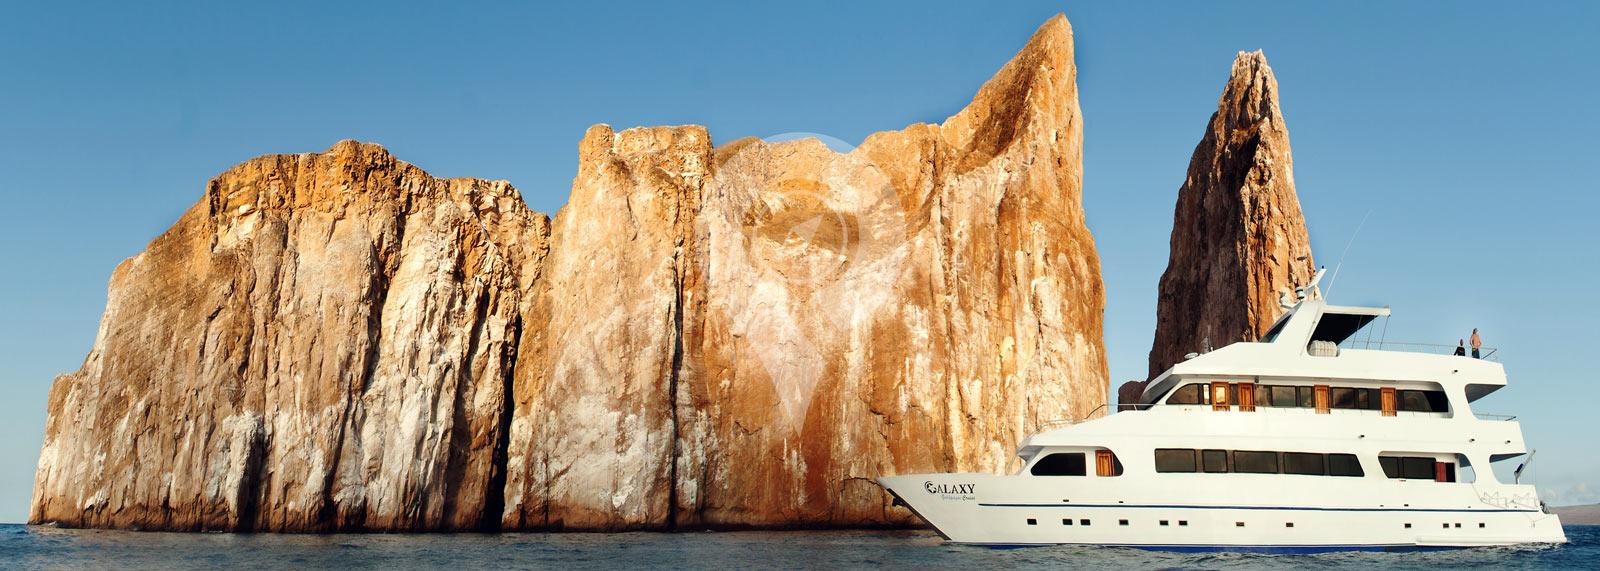 Galaxy Galapagos Yacht